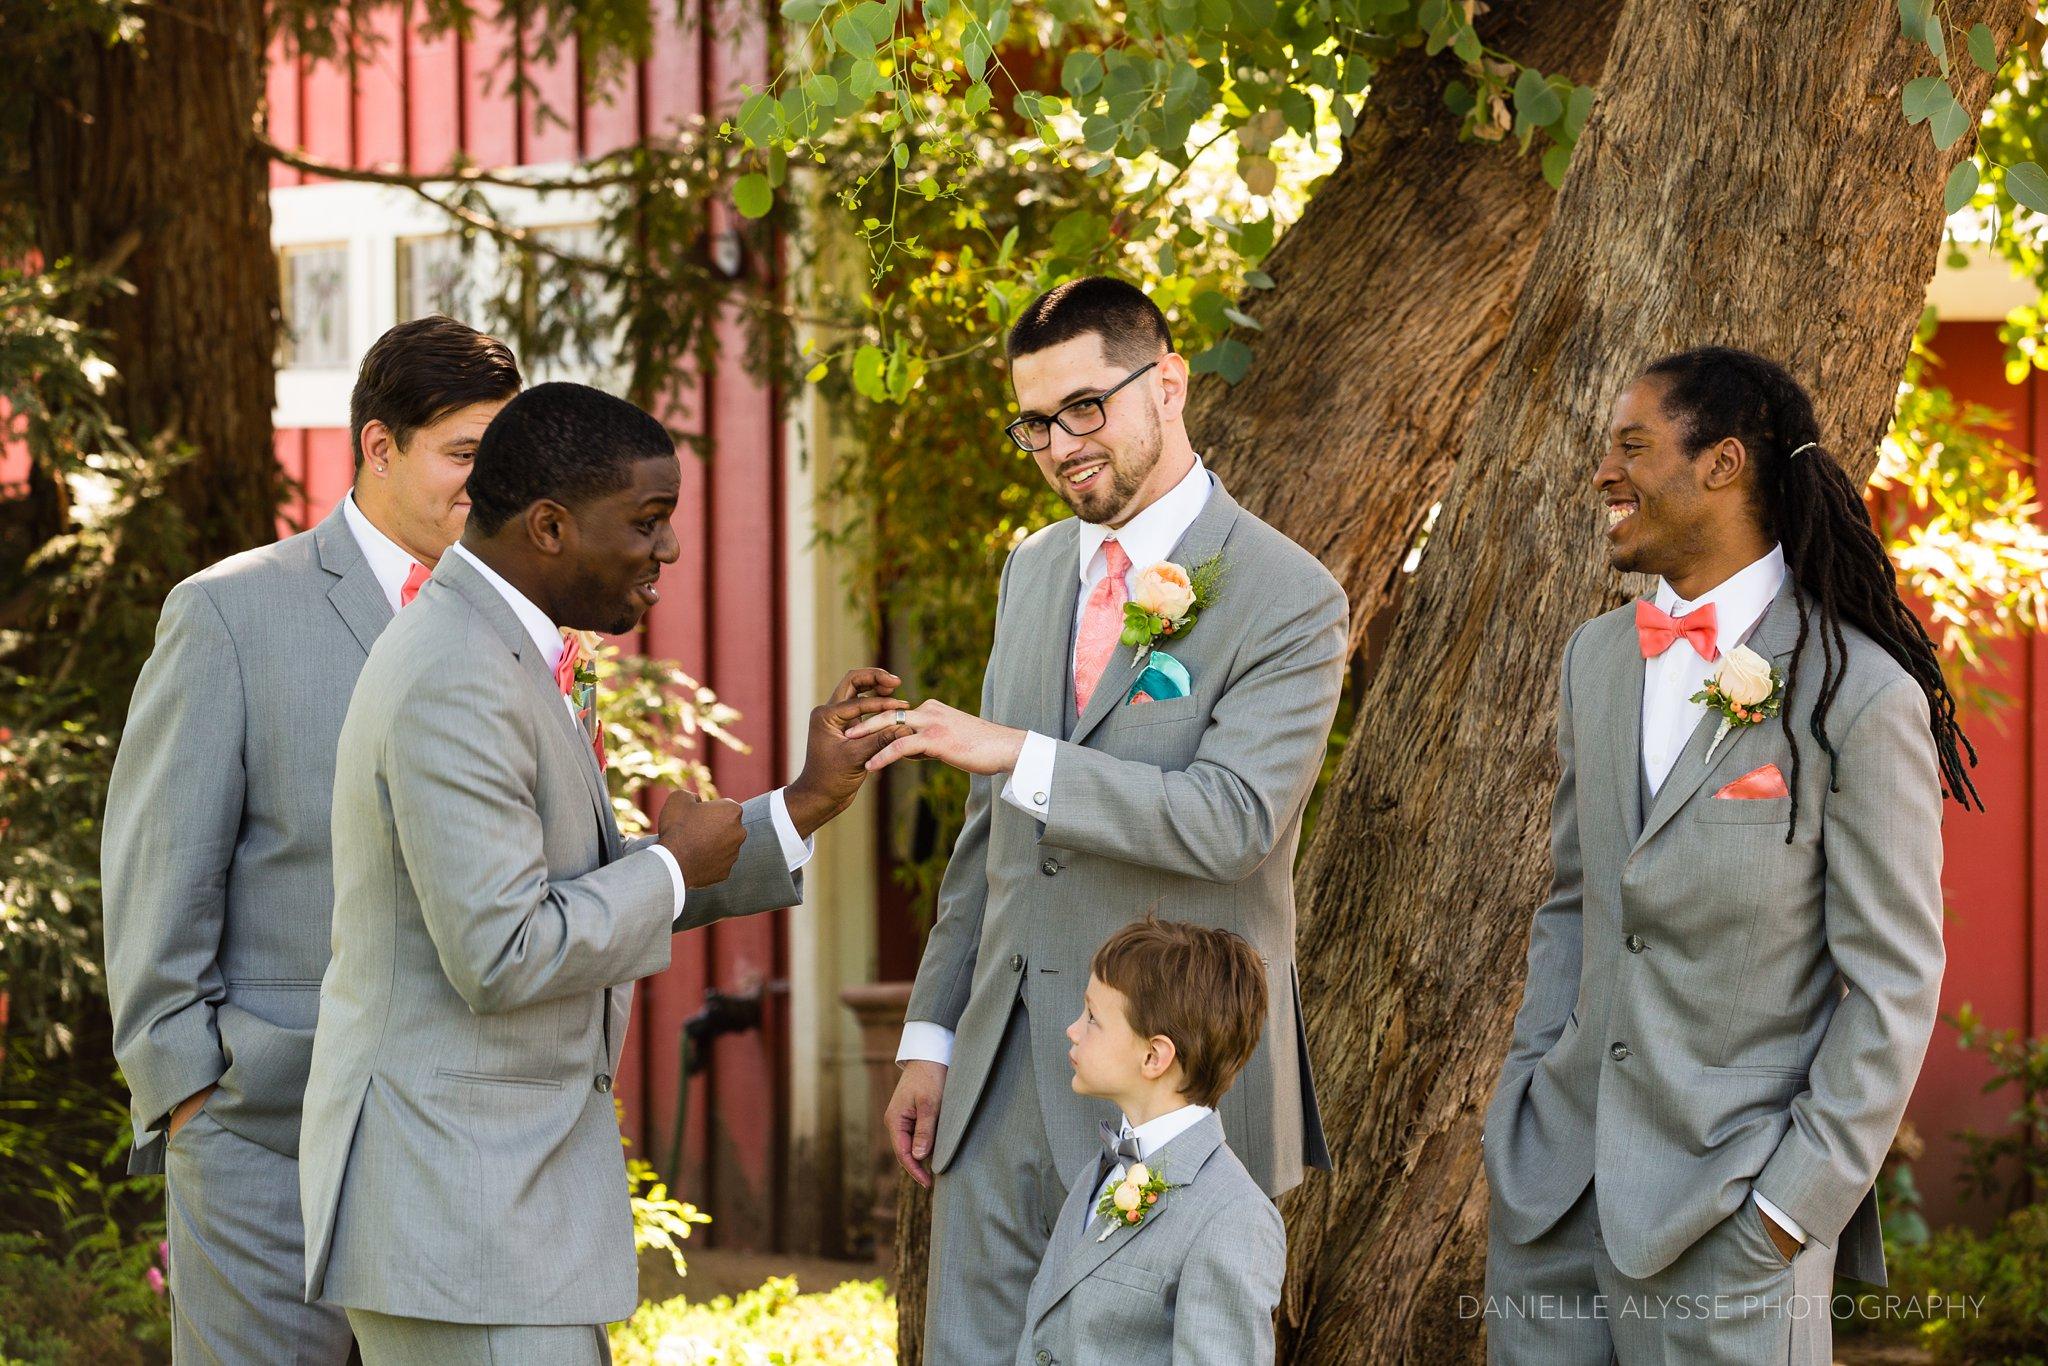 170507_blog_megan_david_wedding_loomis_flower_farm_inn_danielle_alysse_photography_sacramento_photographer0296_WEB.jpg